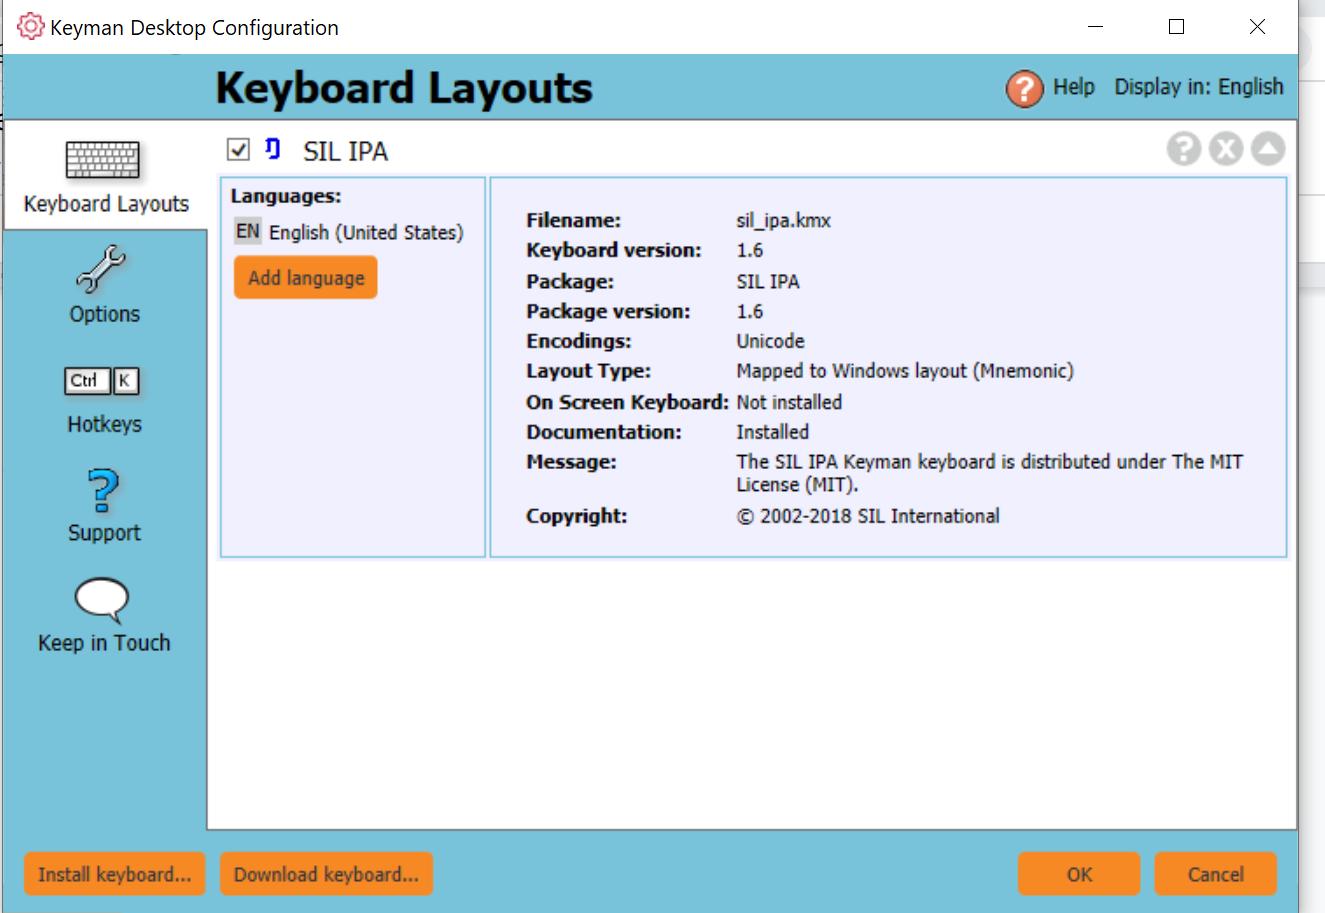 screenshot of keyboards in Keyman